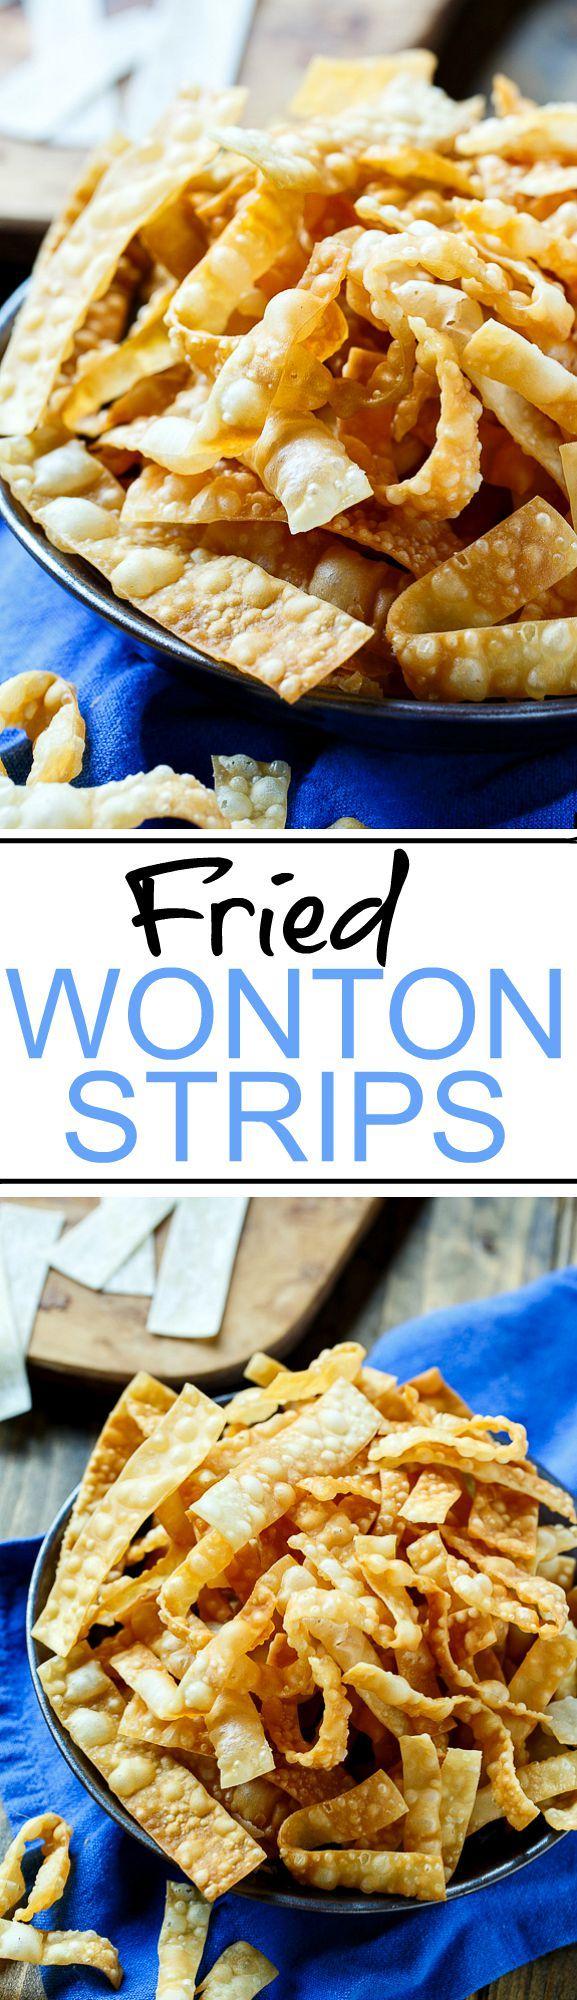 Fried Wonton Strips - Only 2 ingredients!